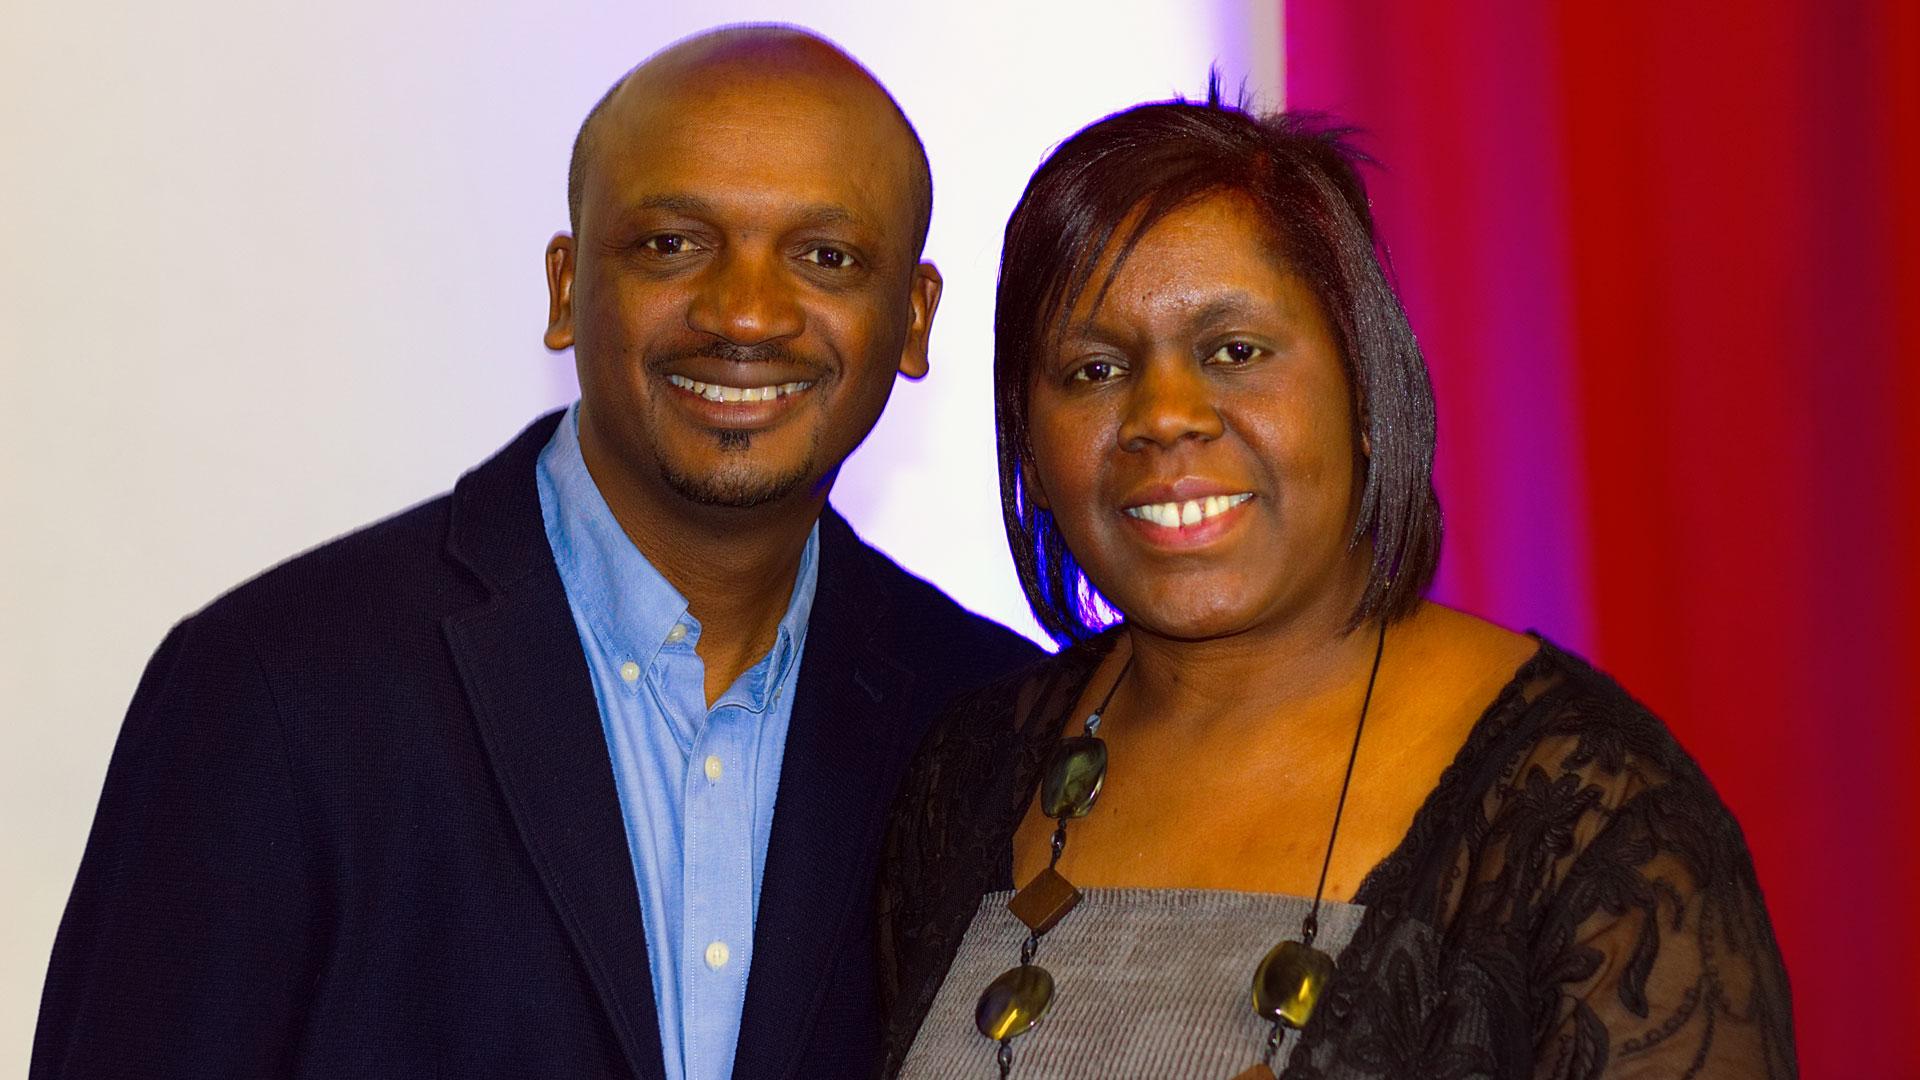 Ezekiel and Mahongo Shibemba